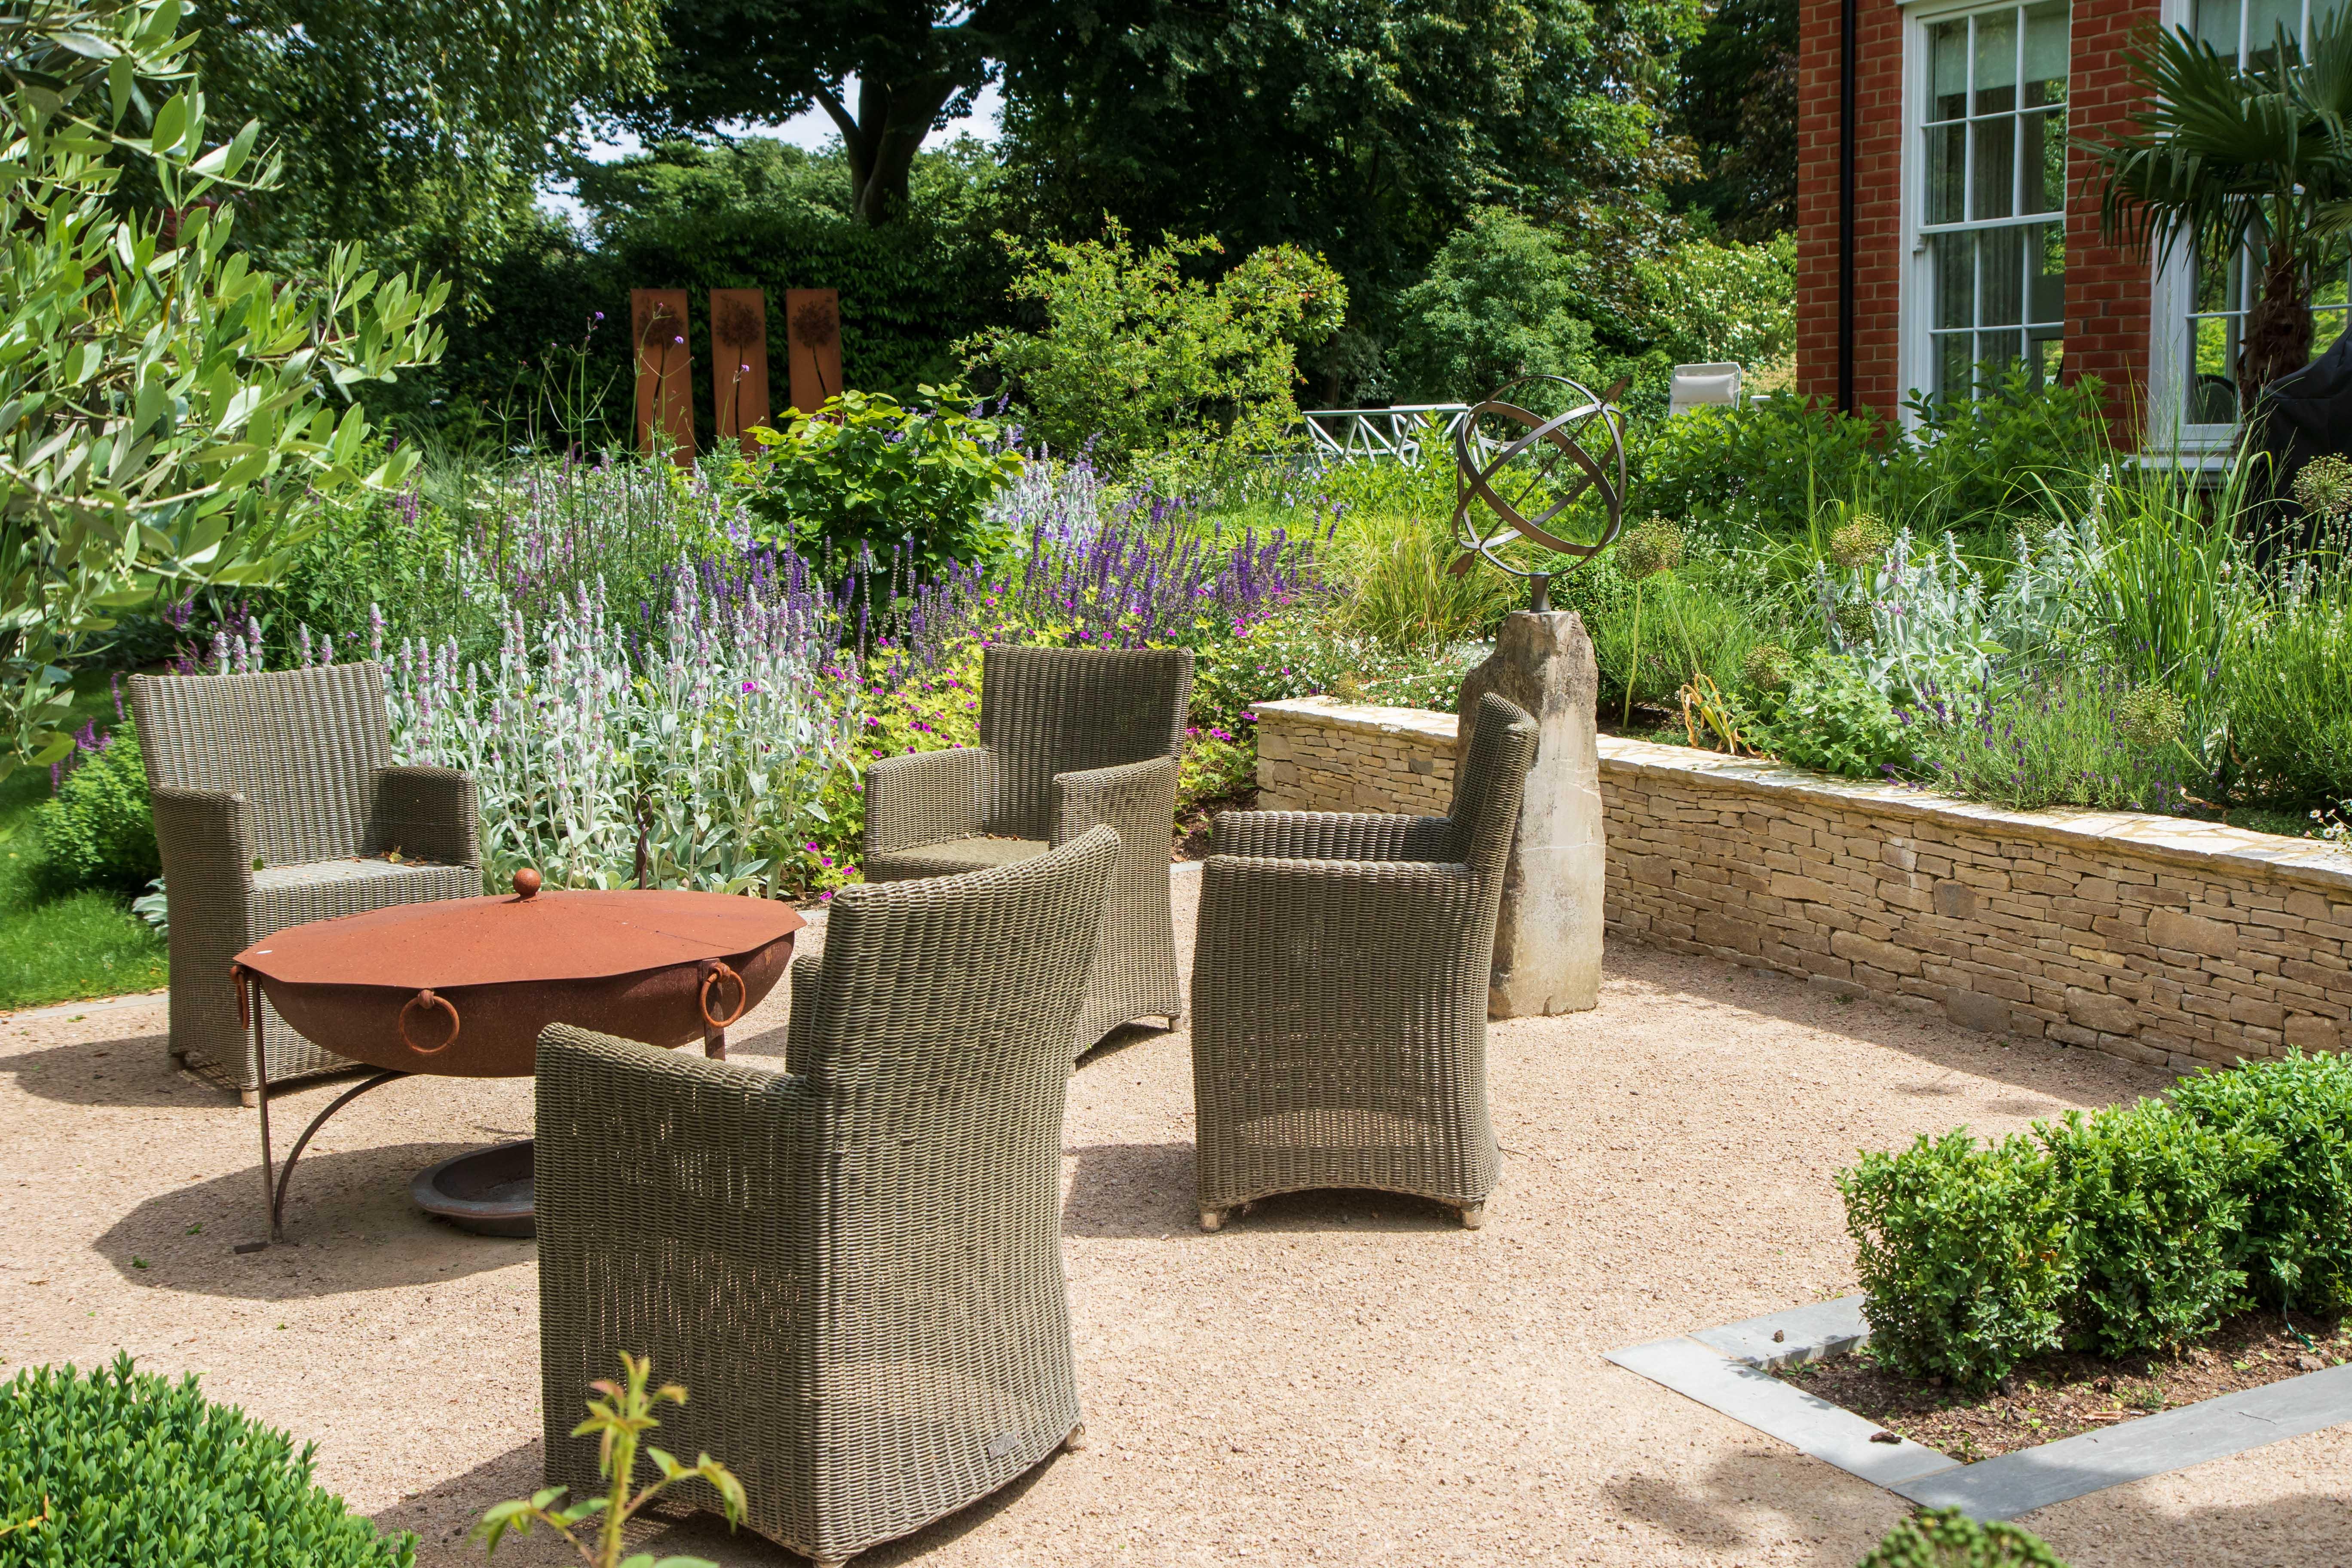 Home Design Ideas Decorating Gardening: Award-winning Garden Landscape Design